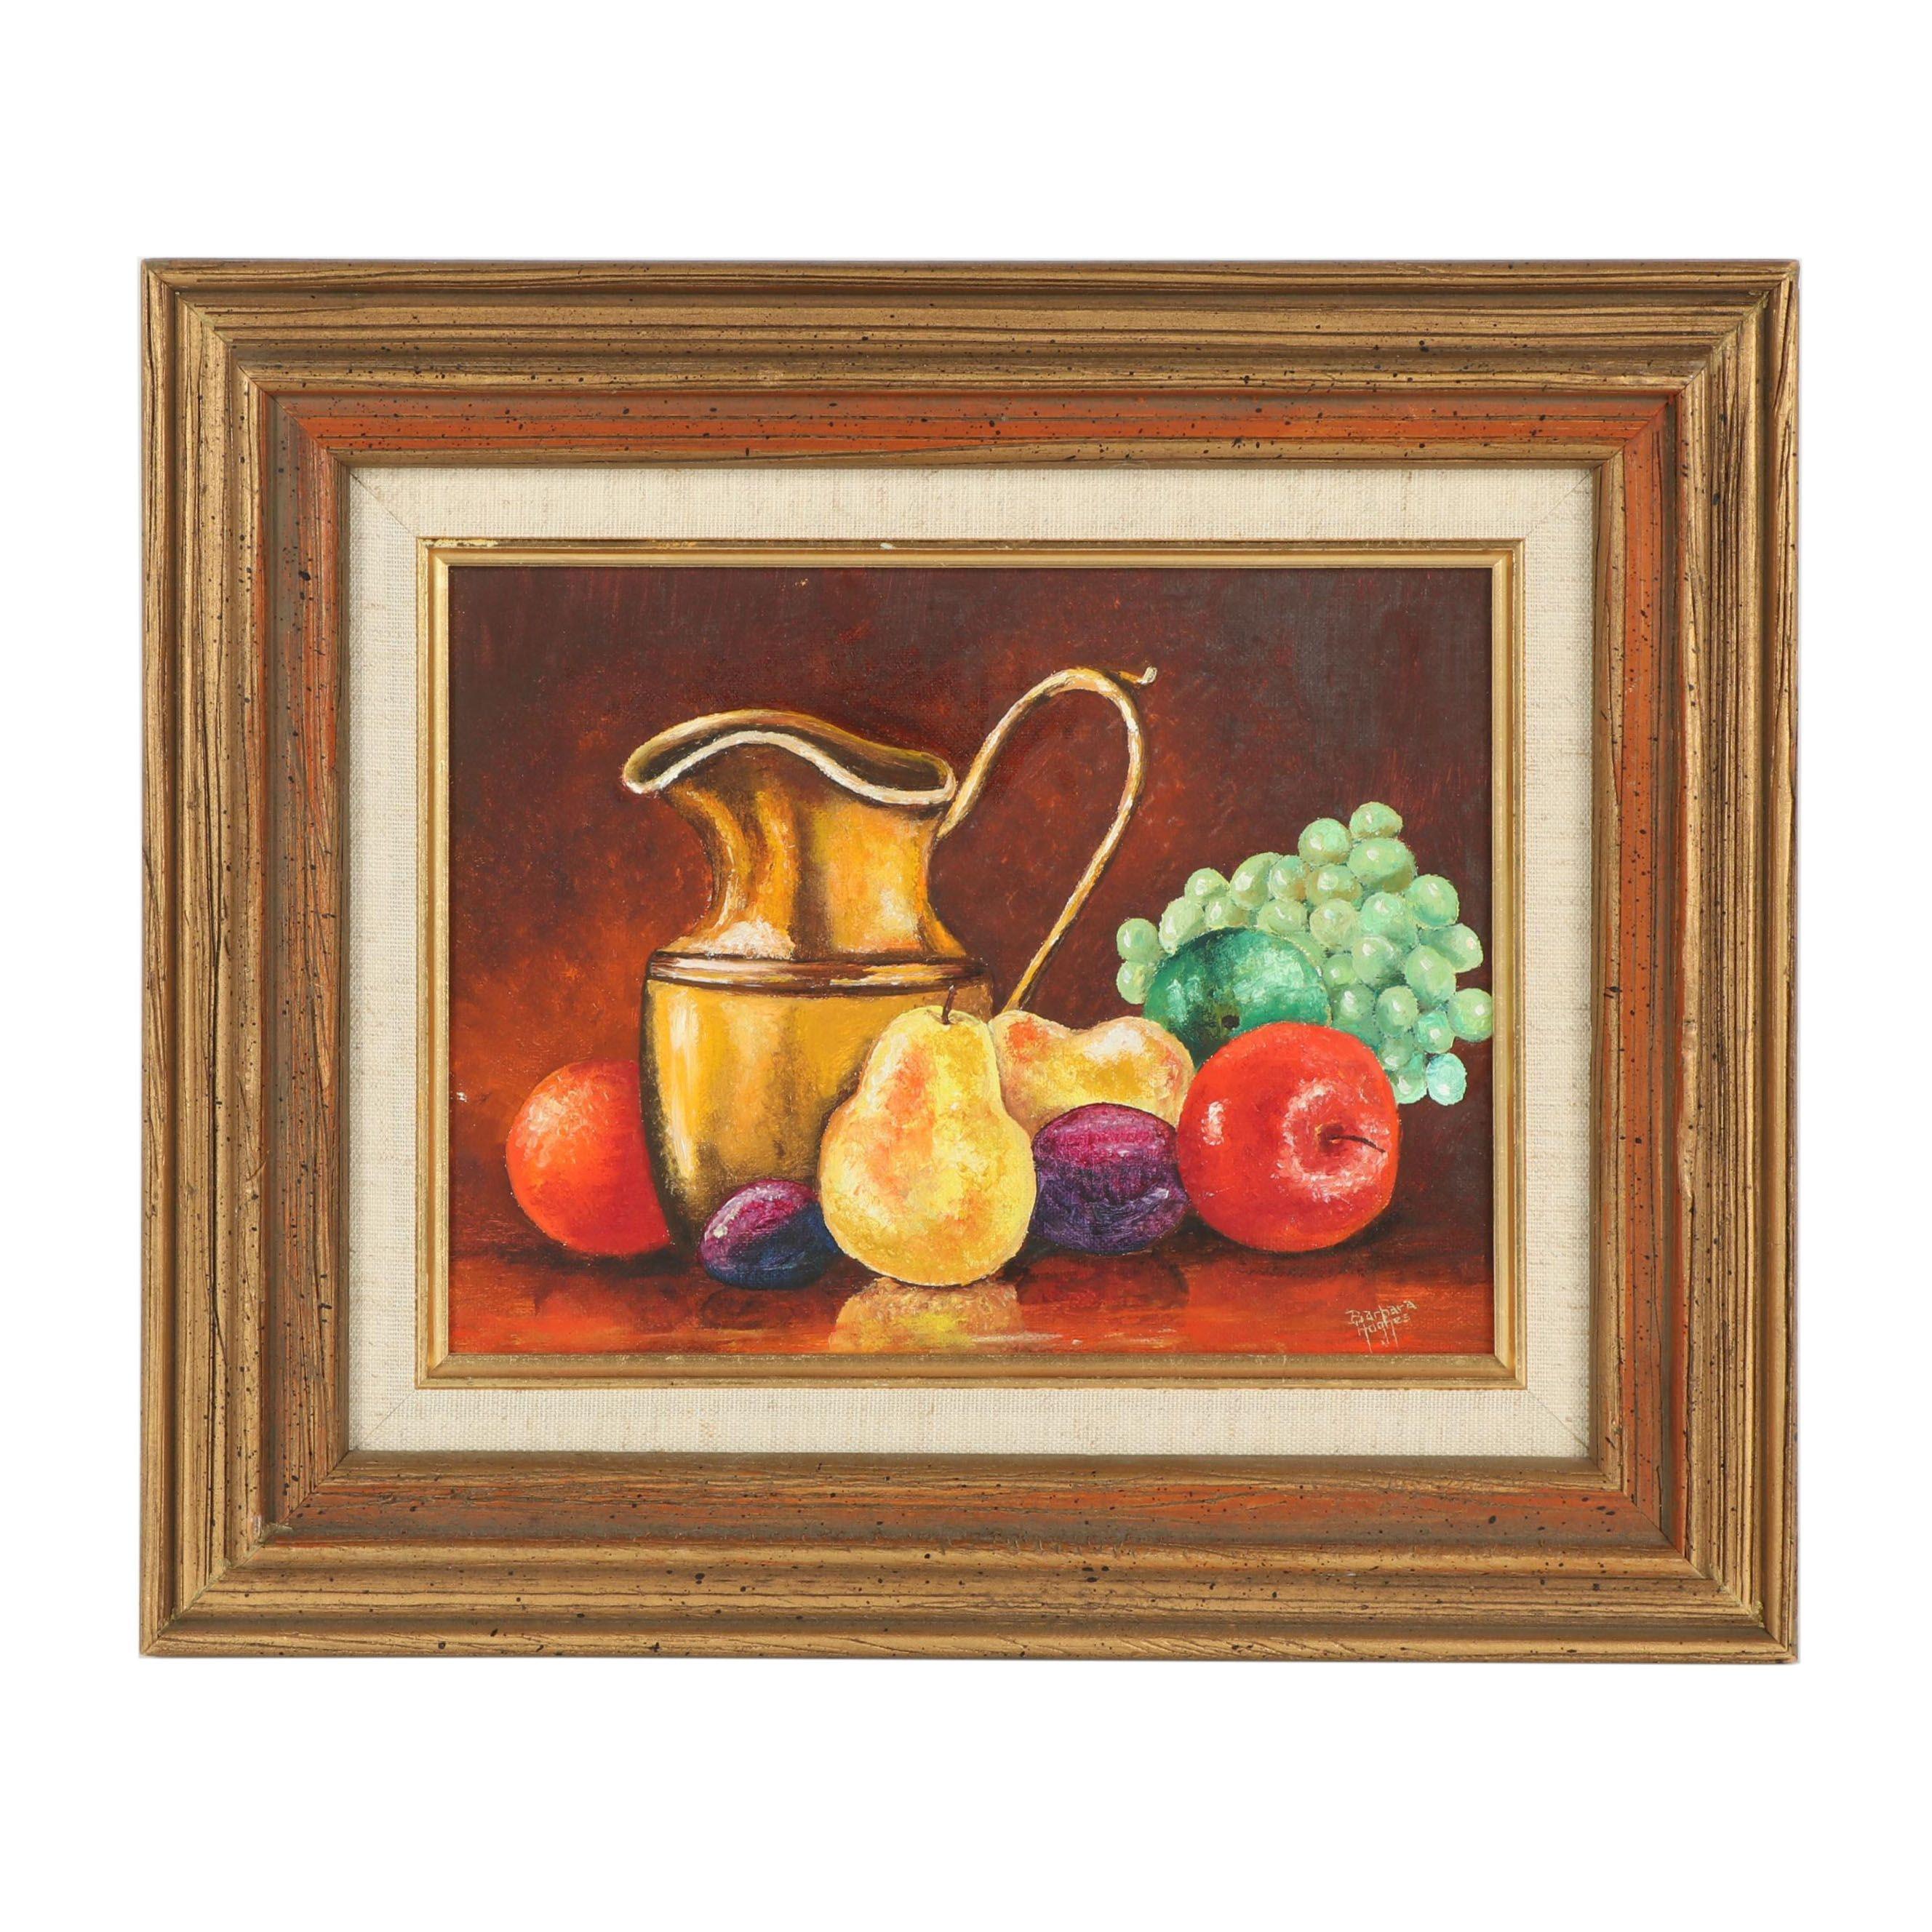 Mid 20th Century Fruit Still Life Oil Painting